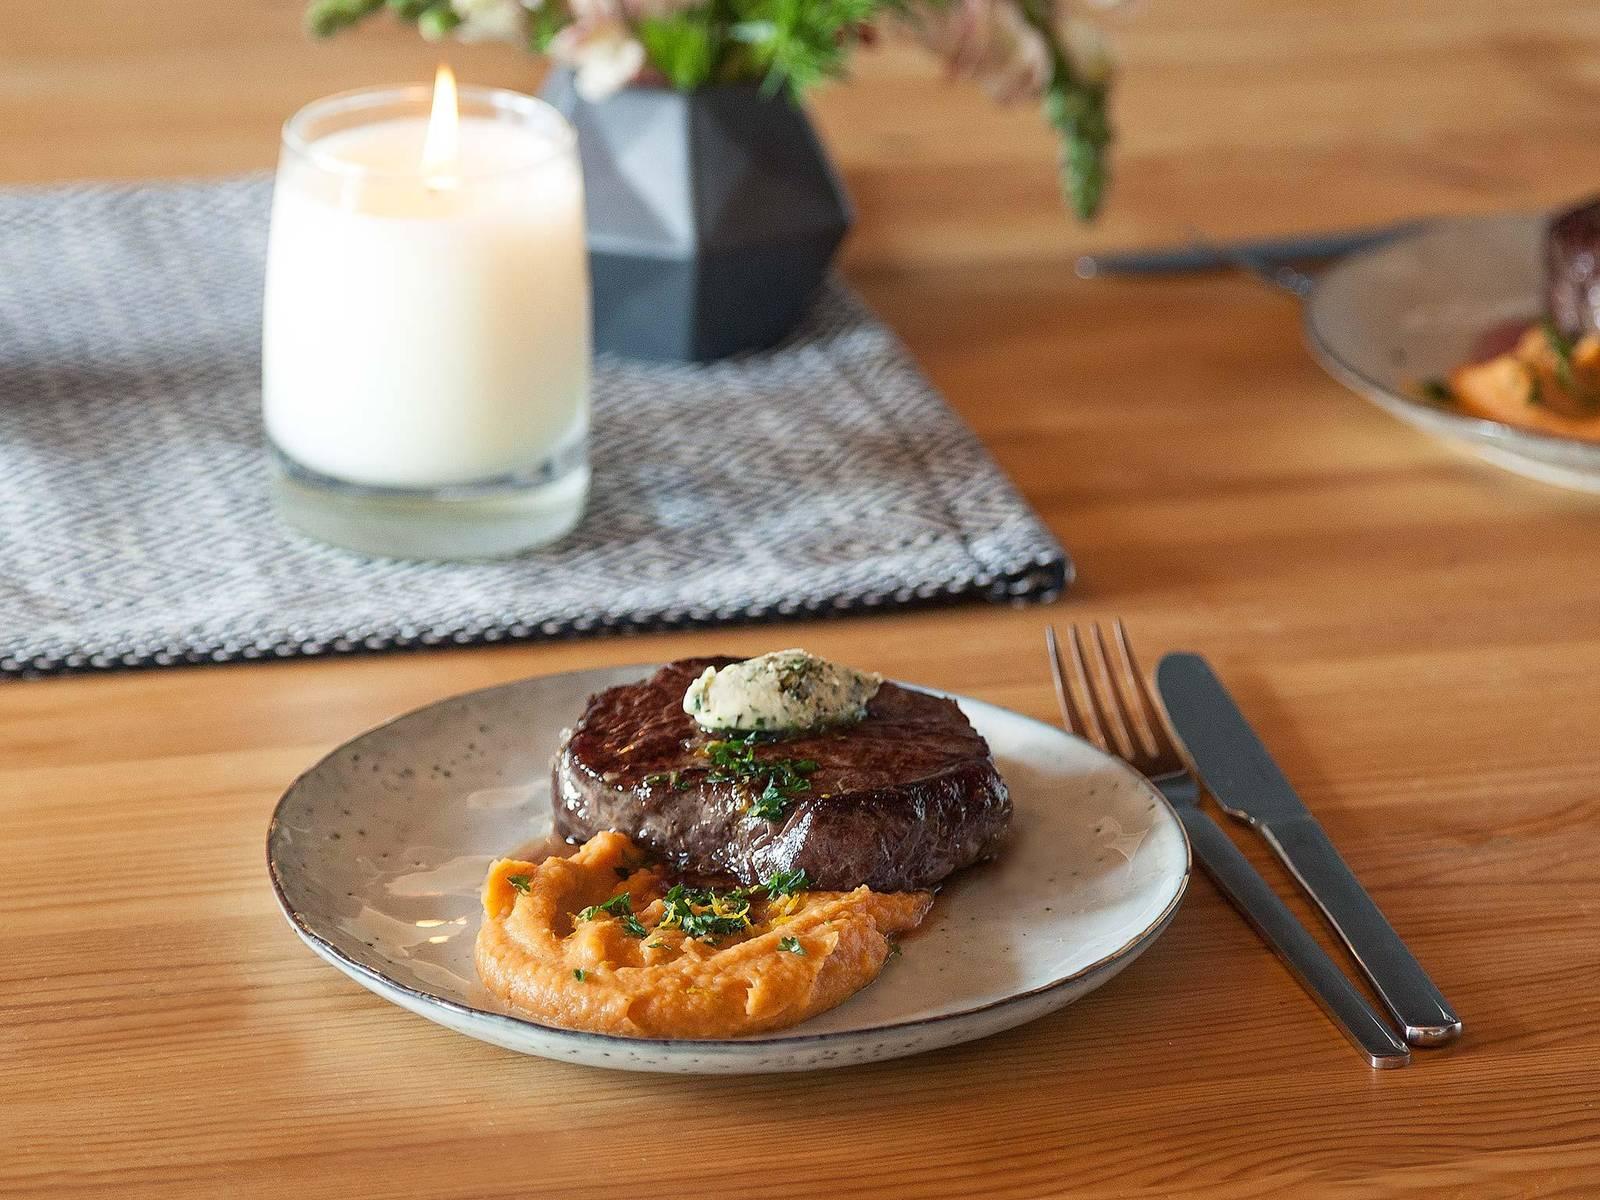 Sous-Vide-Steak mit Süßkartoffelpüree und Kräuterbutter